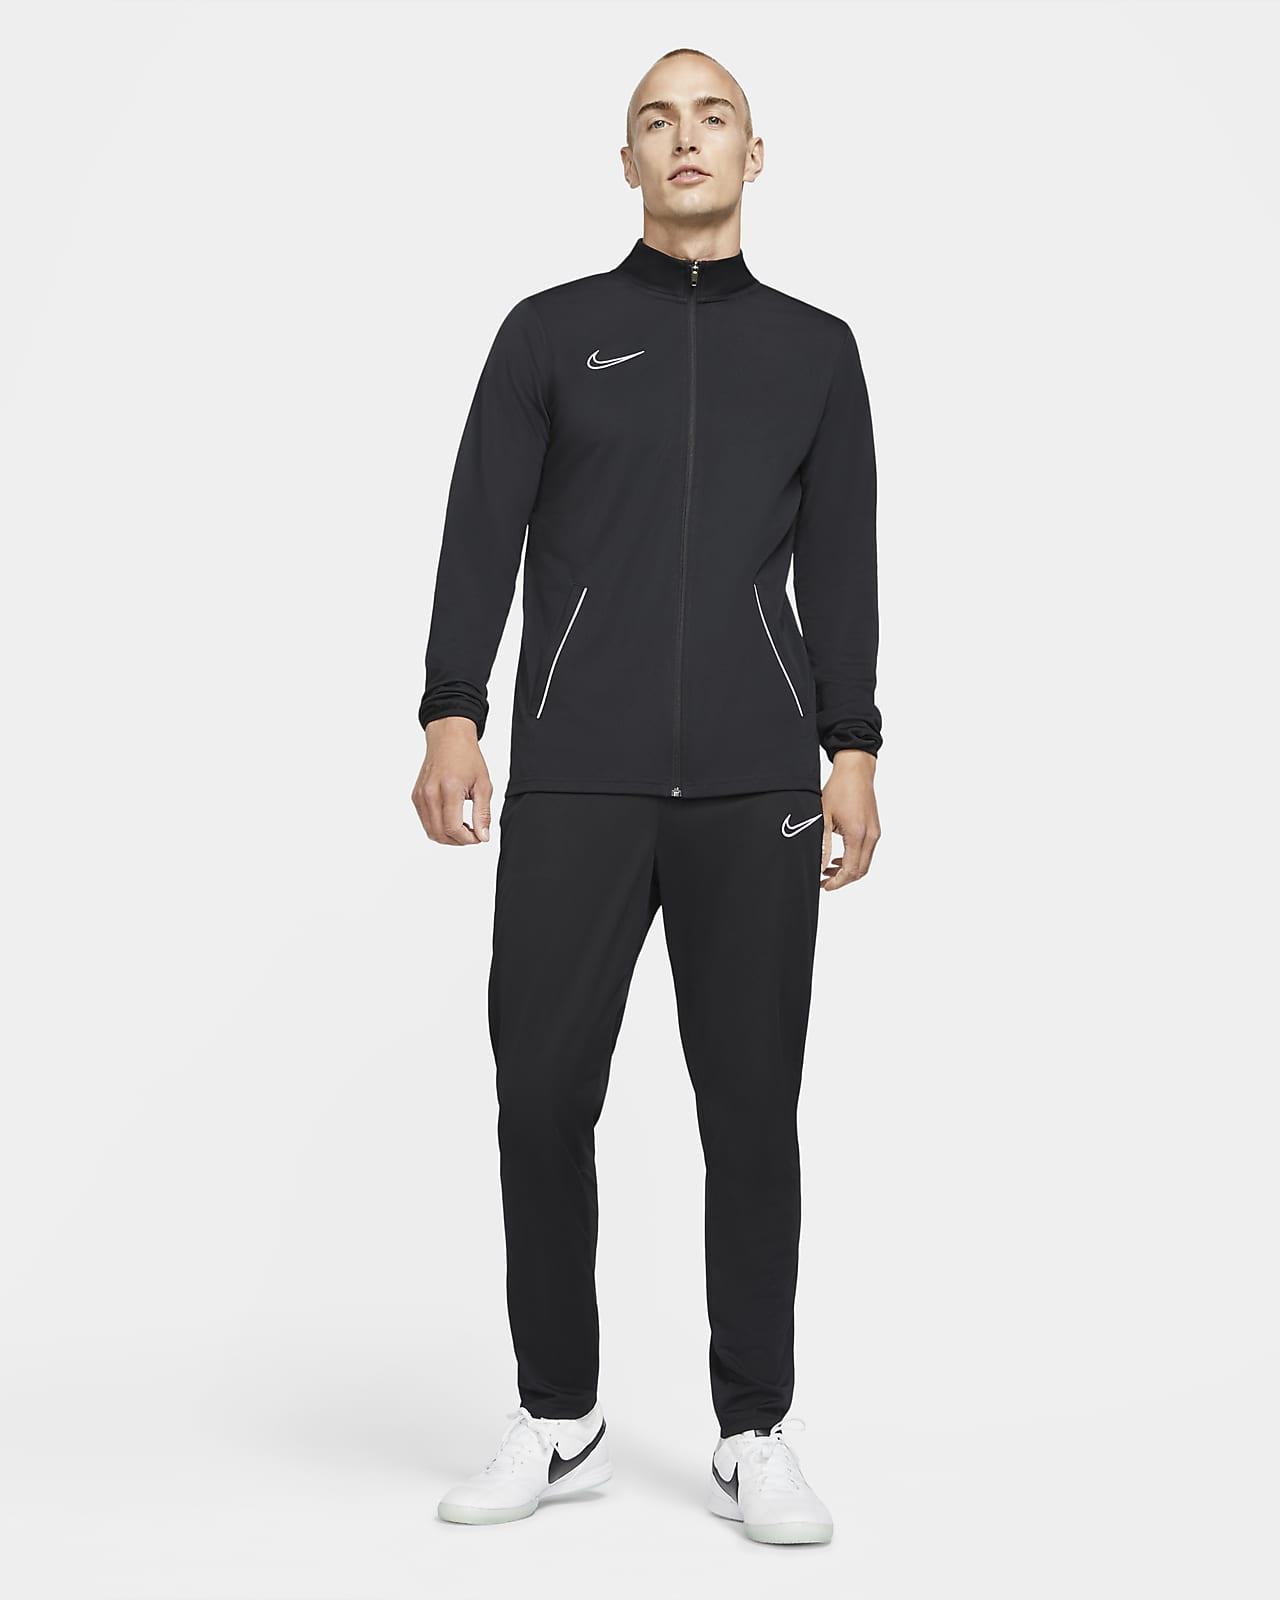 Nike Dri-FIT Academy Knit voetbaltrainingspak voor heren